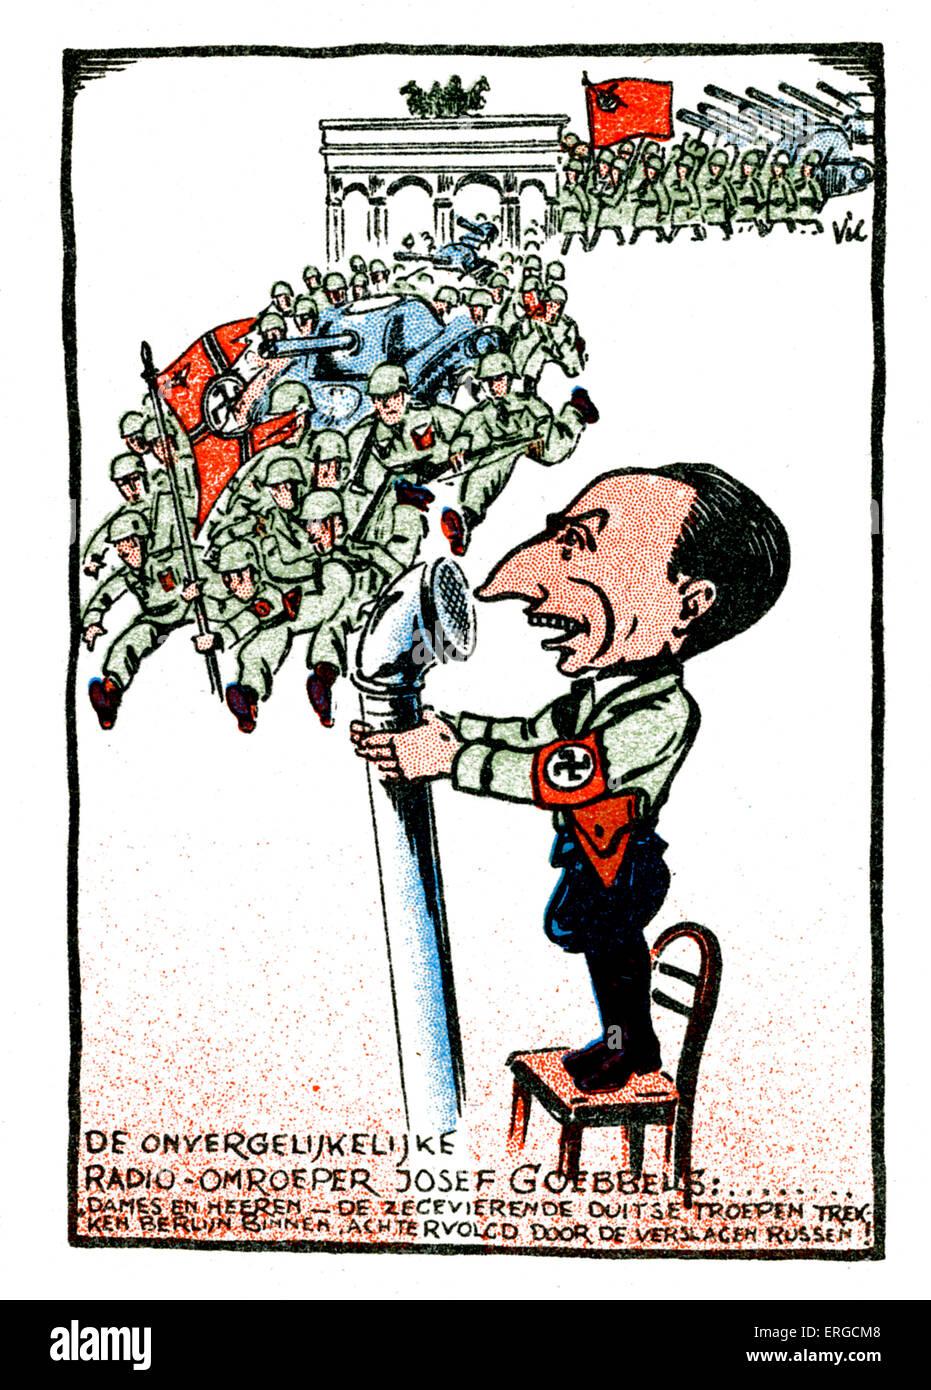 Göbbels -  Dutch caricature. Joseph Göbbels, German Nazi politician and Minister for Propaganda: 29 October 1897 Stock Photo